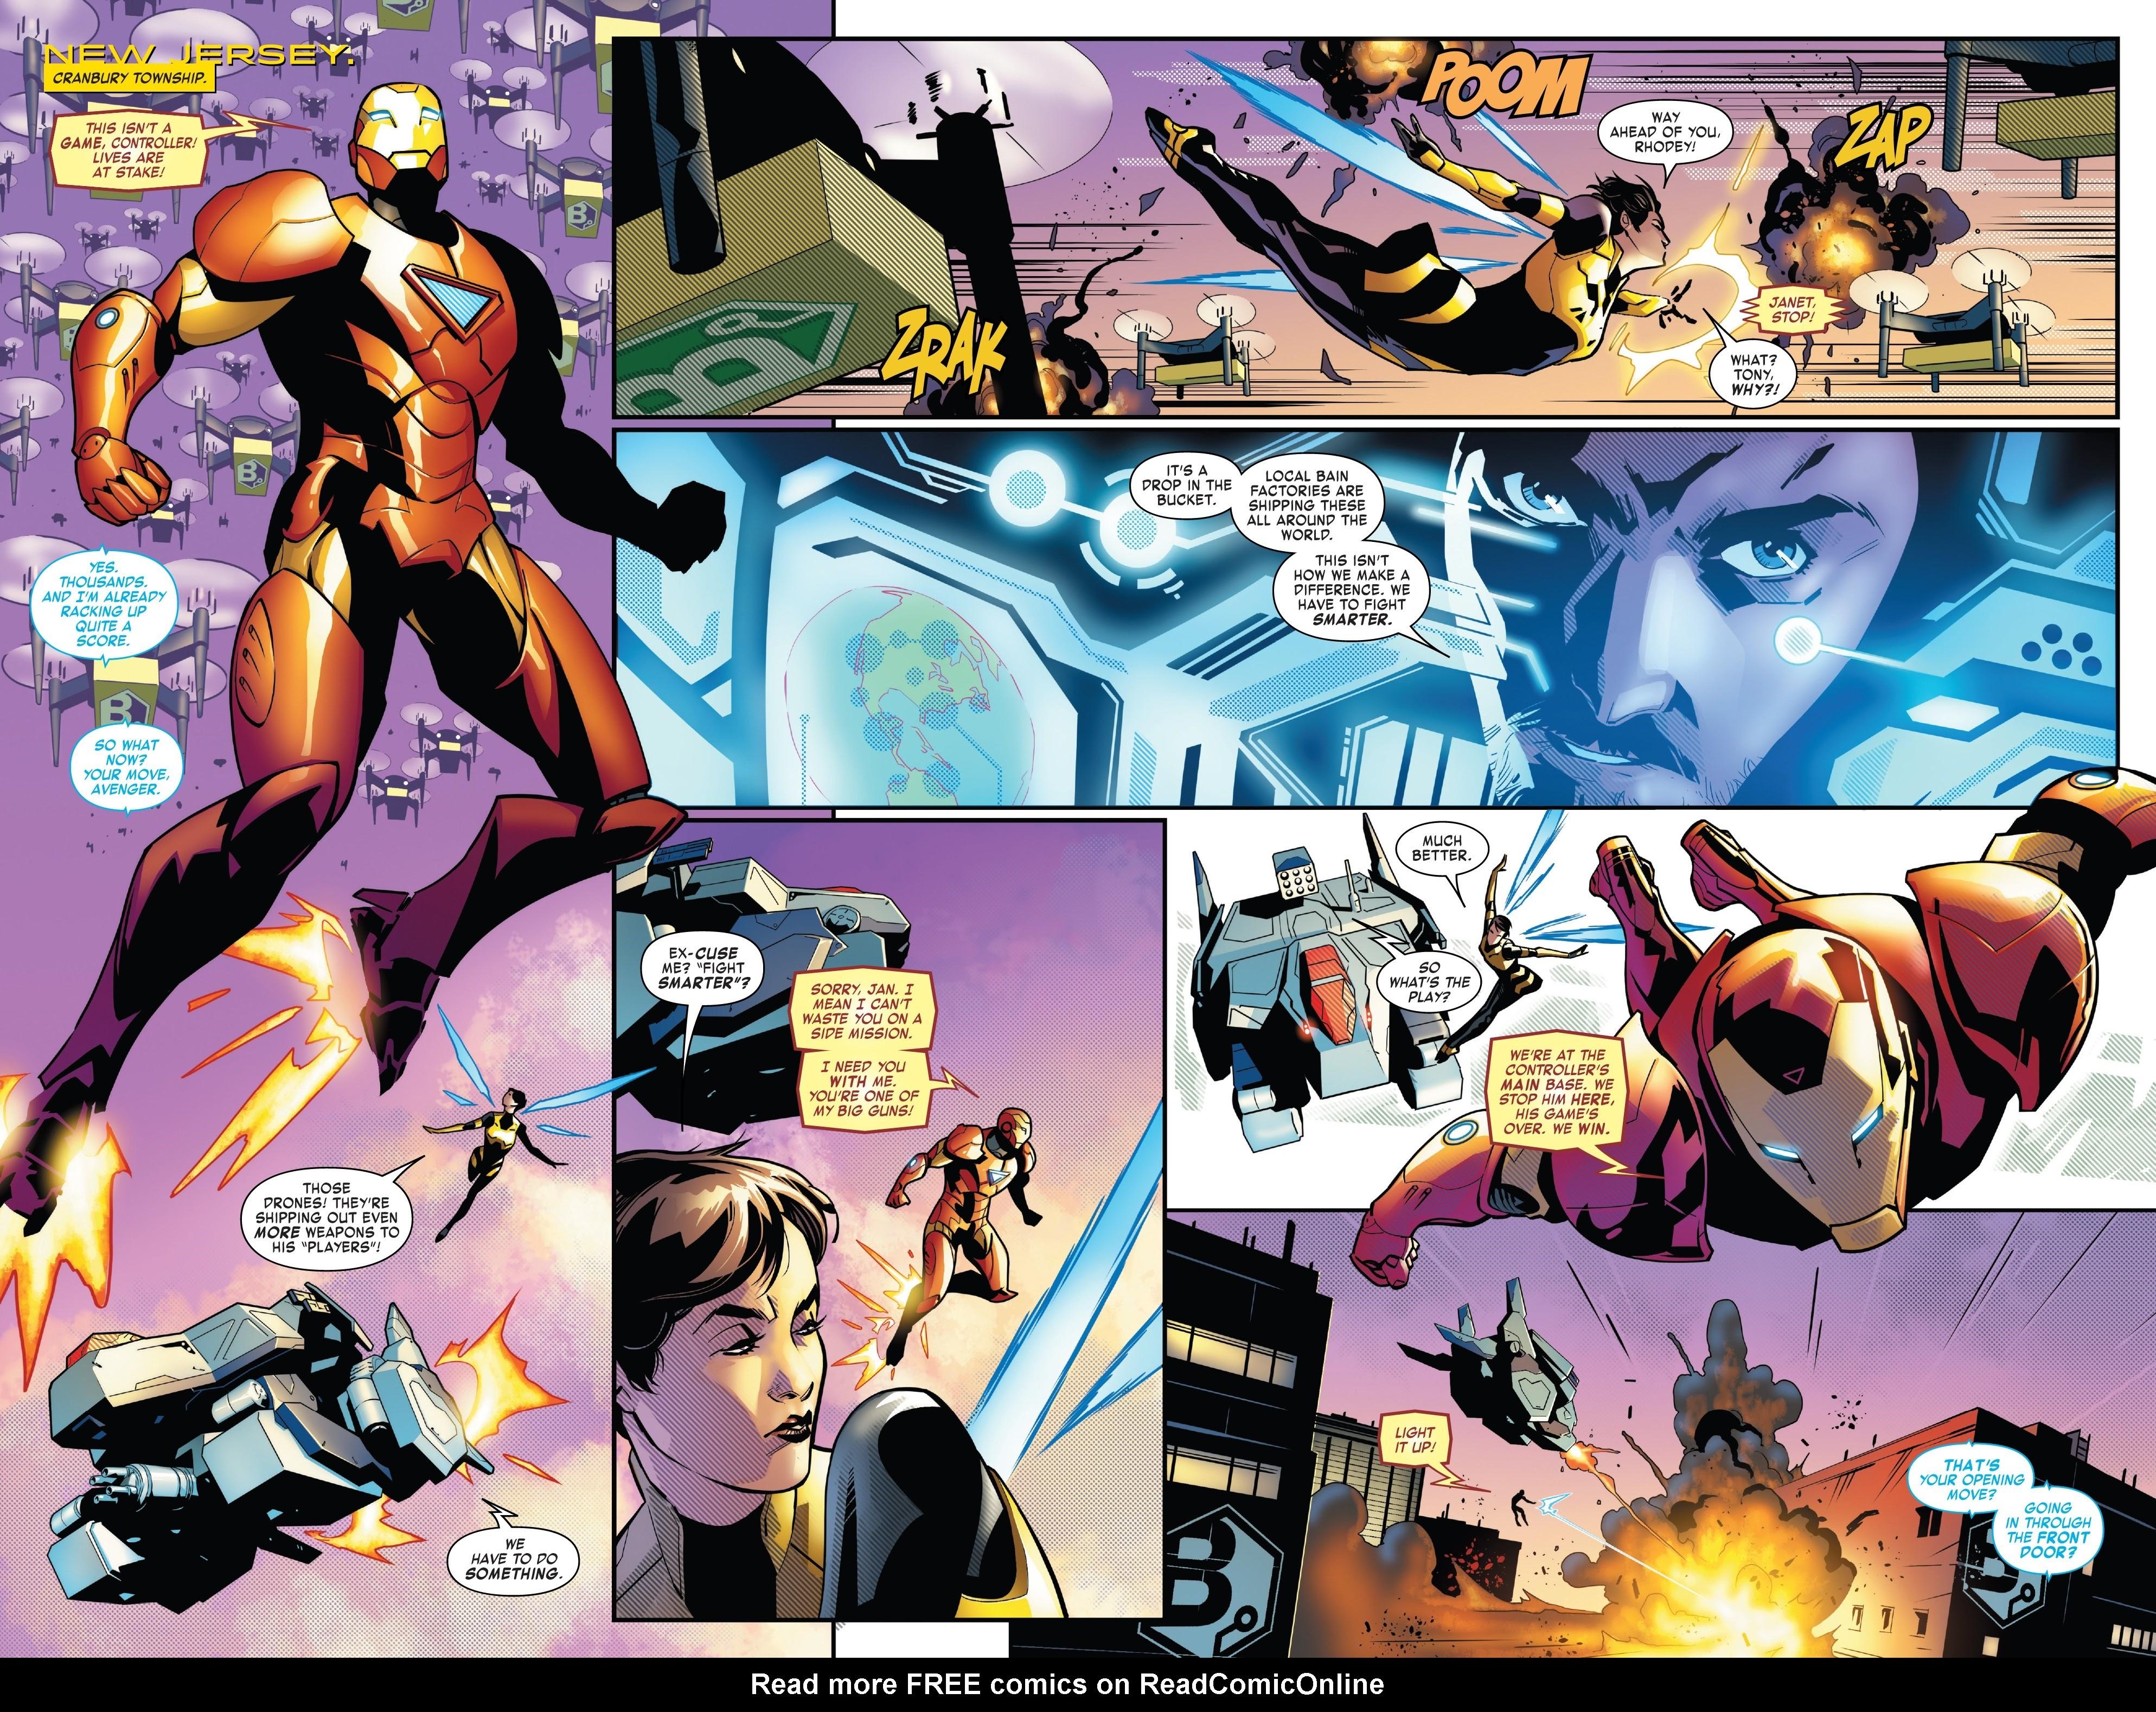 Read online Tony Stark: Iron Man comic -  Issue #8 - 5